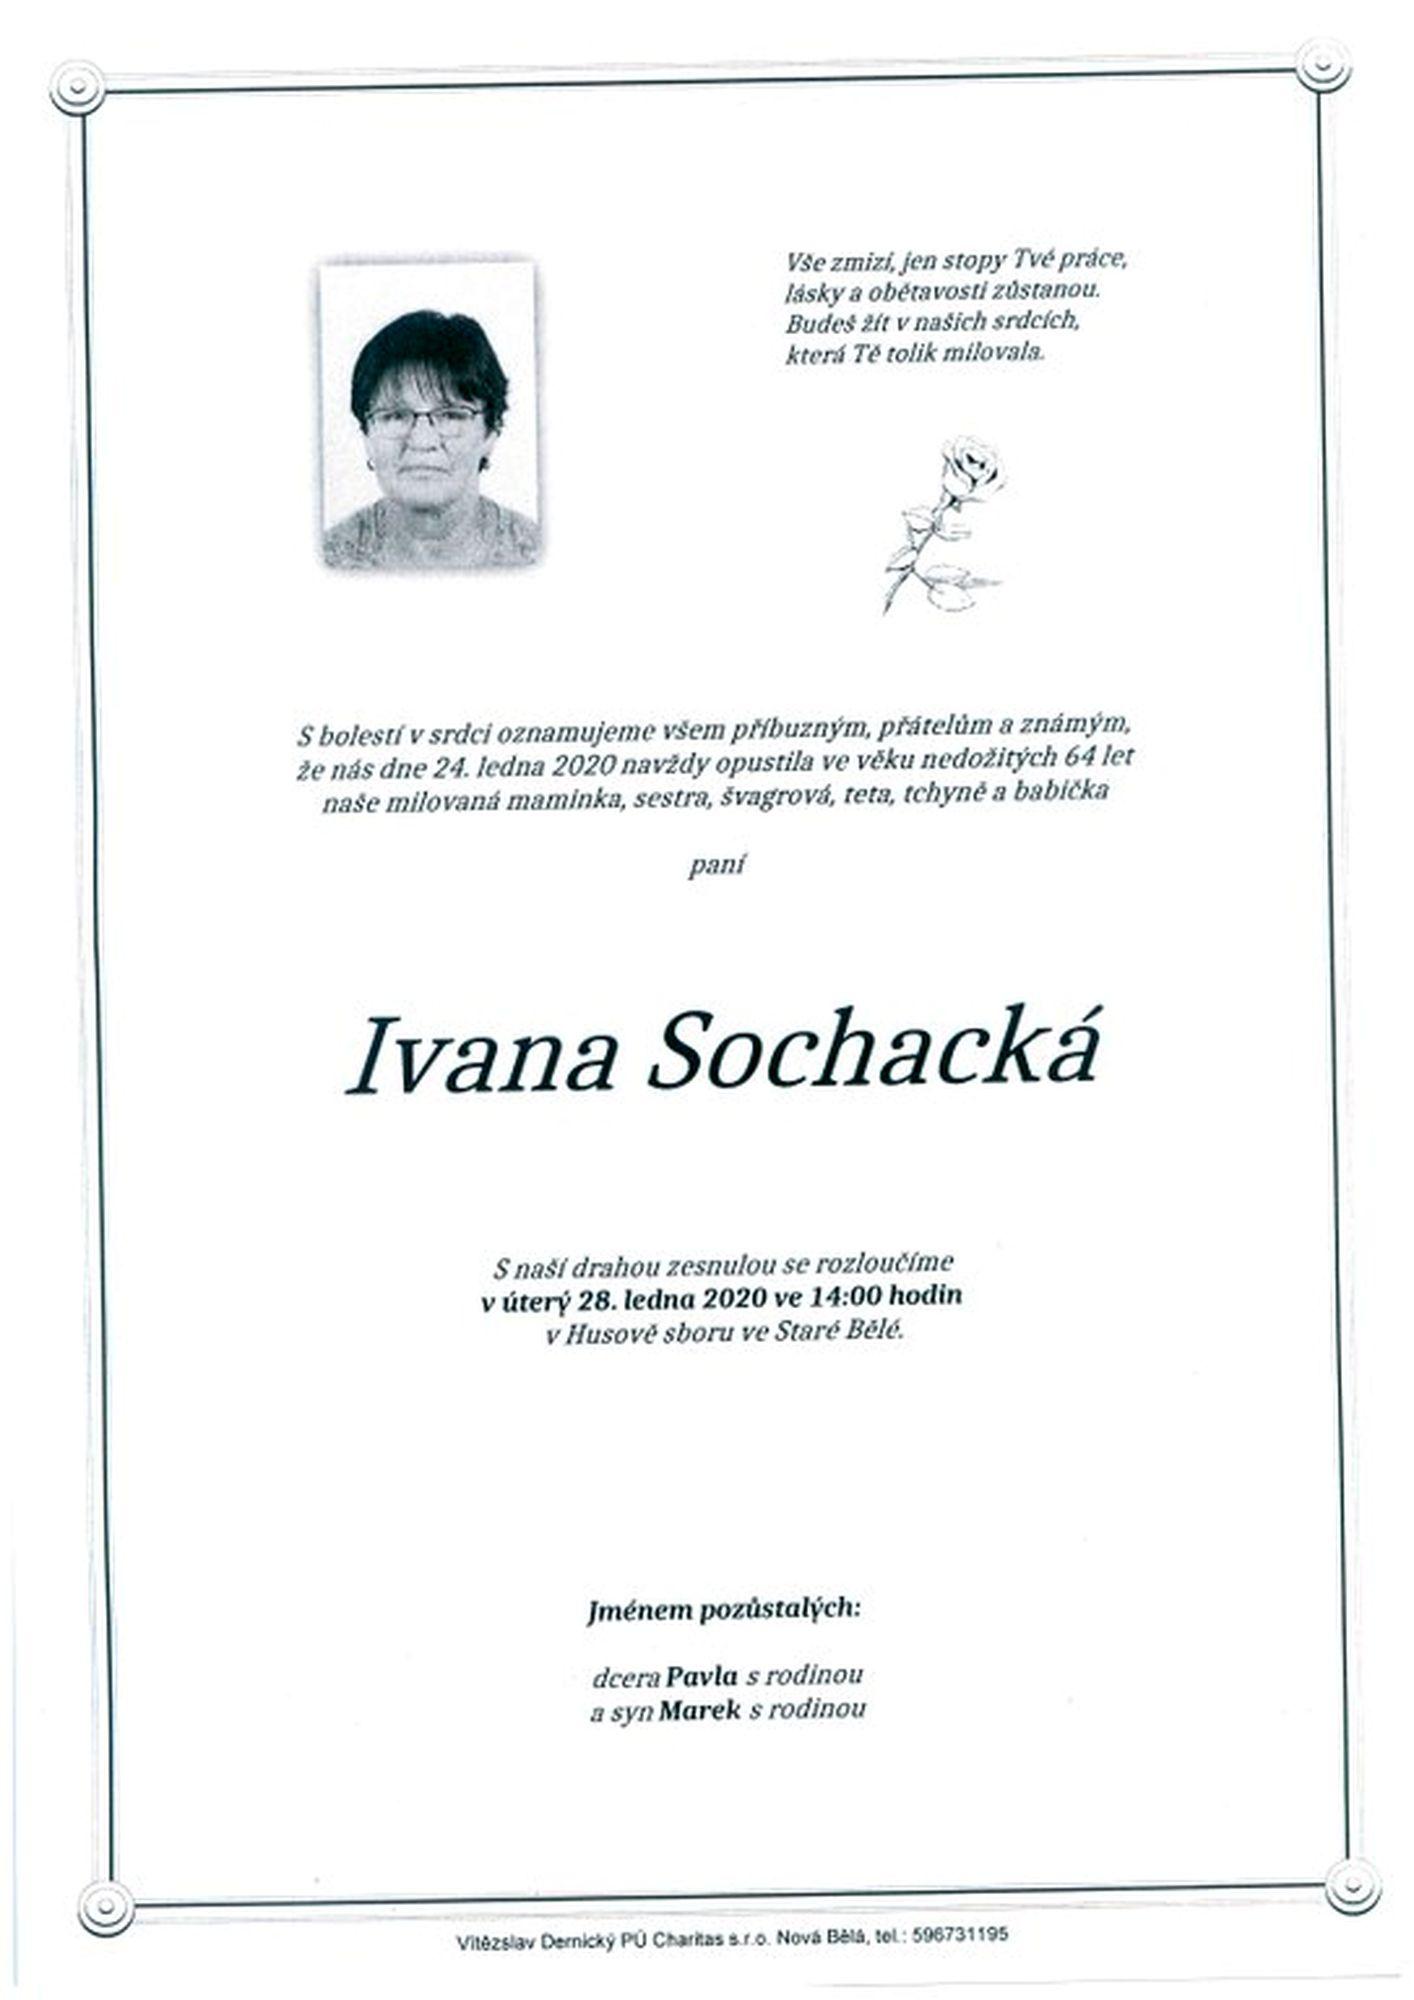 Ivana Sochacká